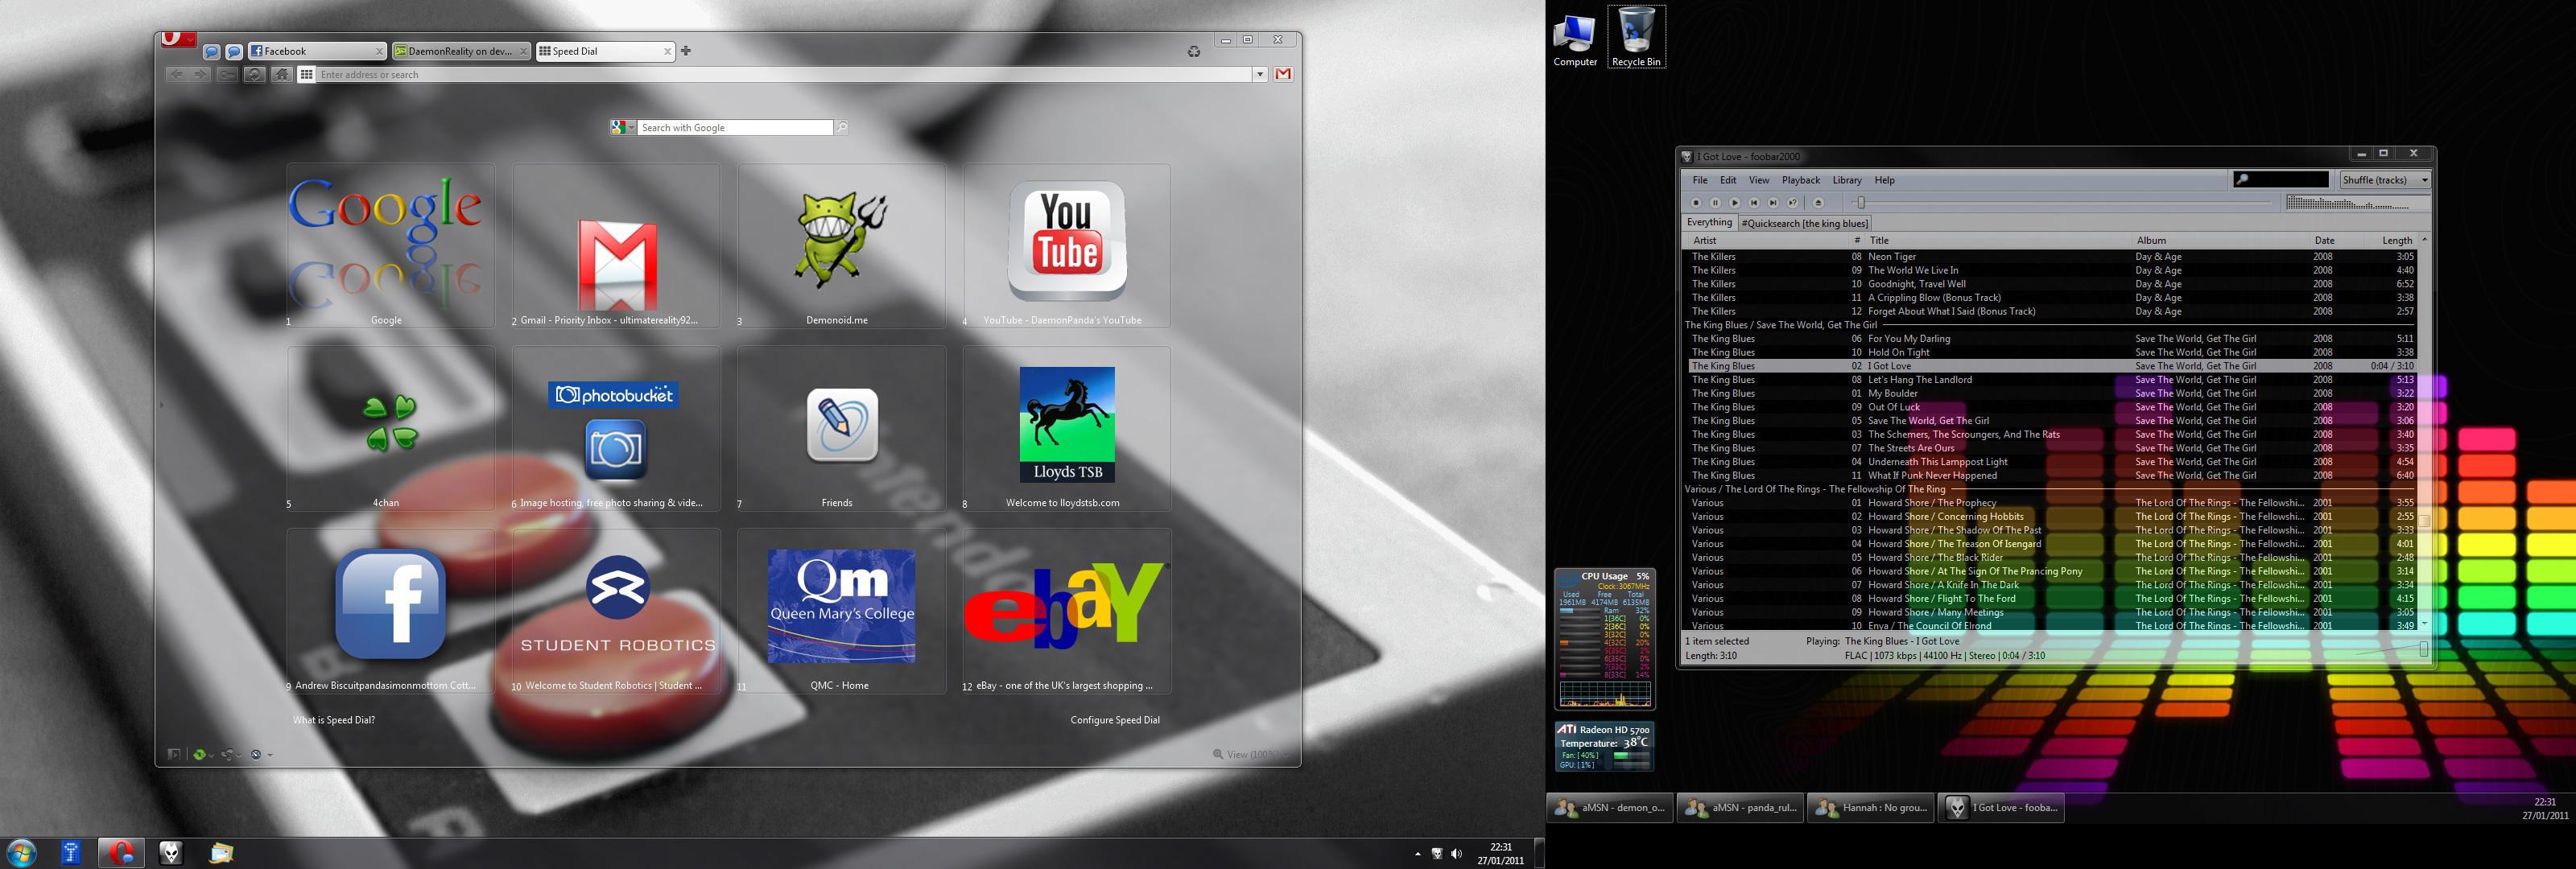 Desktop, Opera and Foobar by DaemonReality